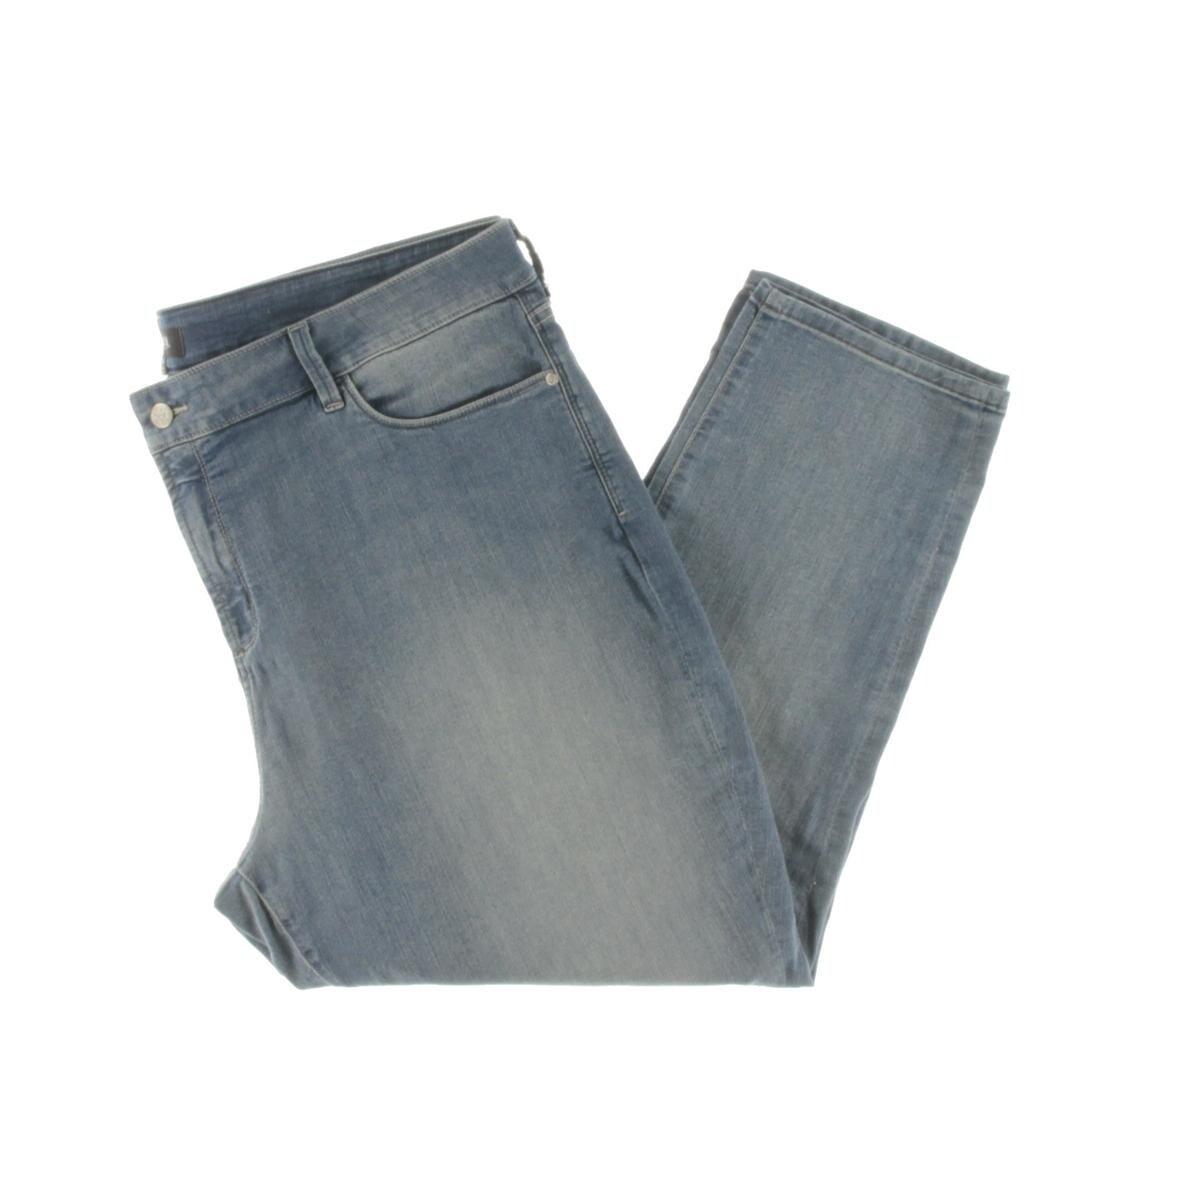 608bb6984134 Shop NYDJ Womens Plus Alina Jeans Light Wash High Rise - Free ...